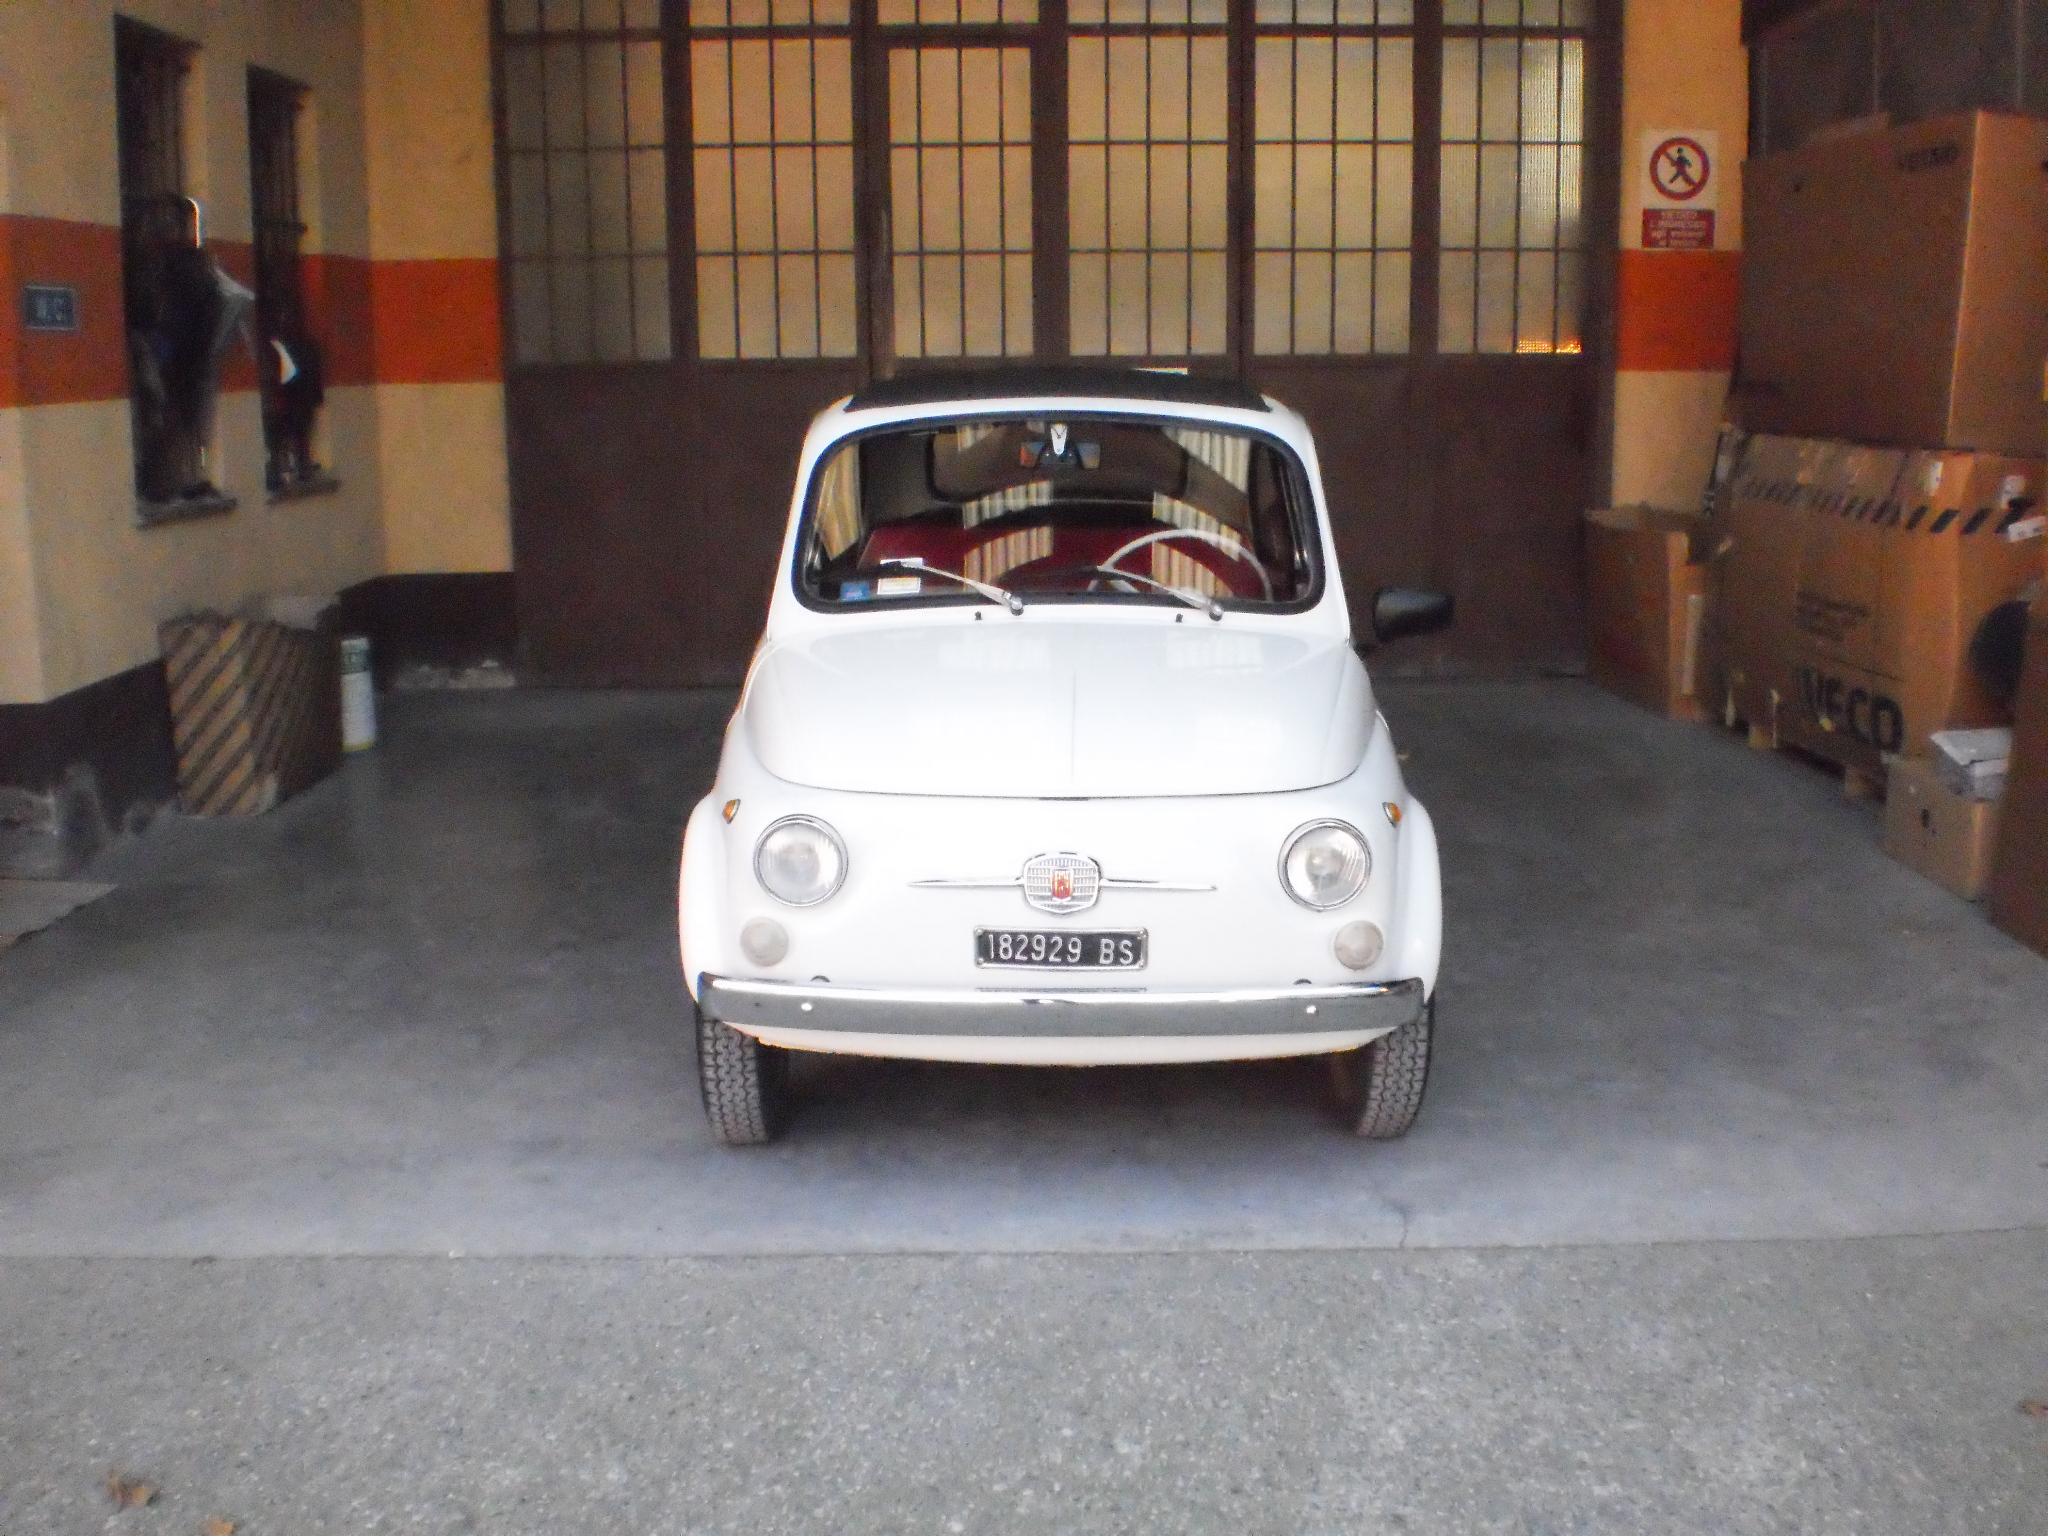 Fiat 500 old